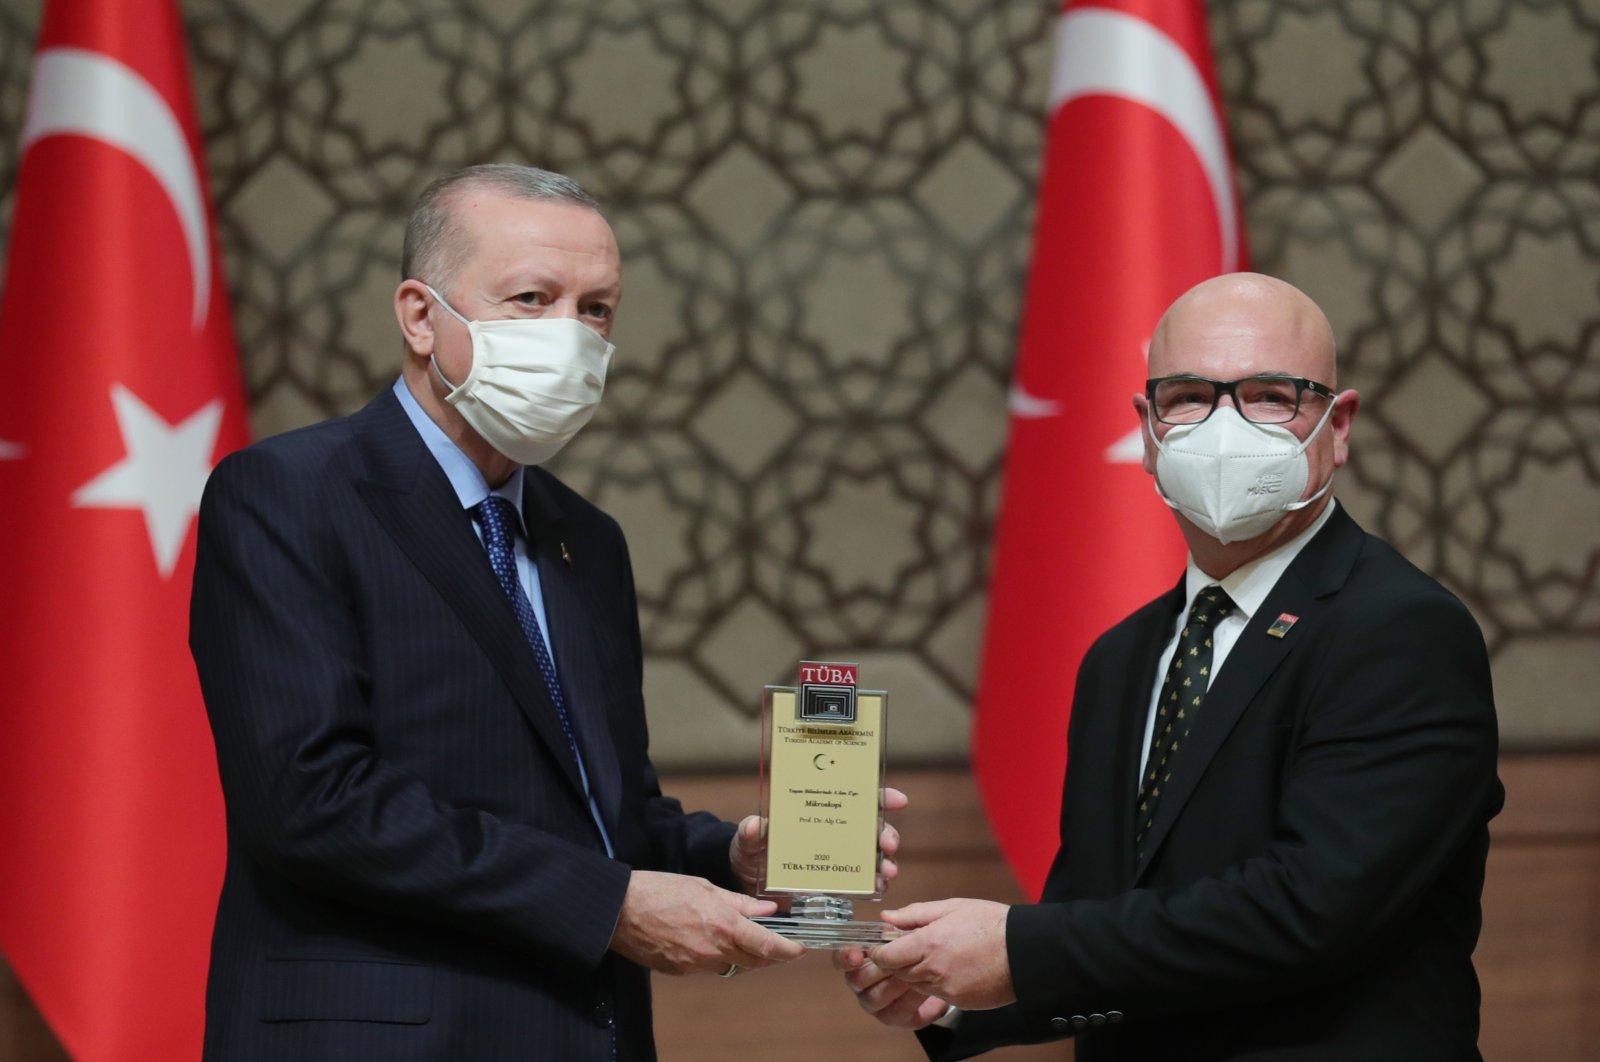 President Recep Tayyip Erdoğan (L) gives an award to professor Alp Can at the science awards ceremony, in the capital Ankara, Turkey, Jan. 28, 2021. (AA Photo)